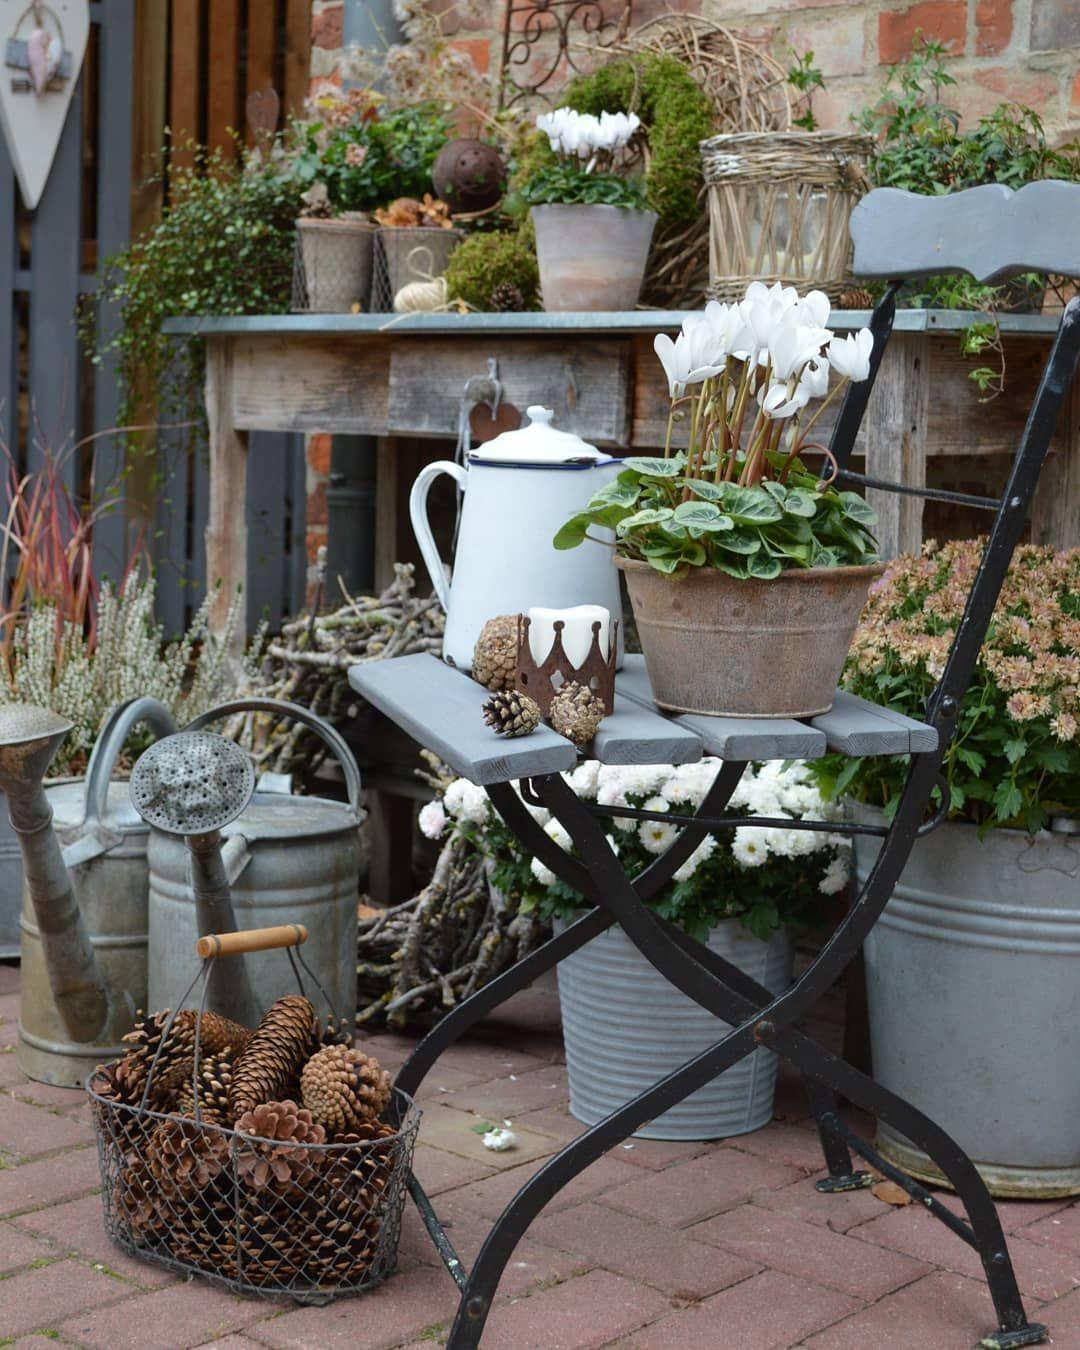 Herbstdeko Garten Tisch In 2020 Garden Yard Ideas Garden Decor Backyard Decor